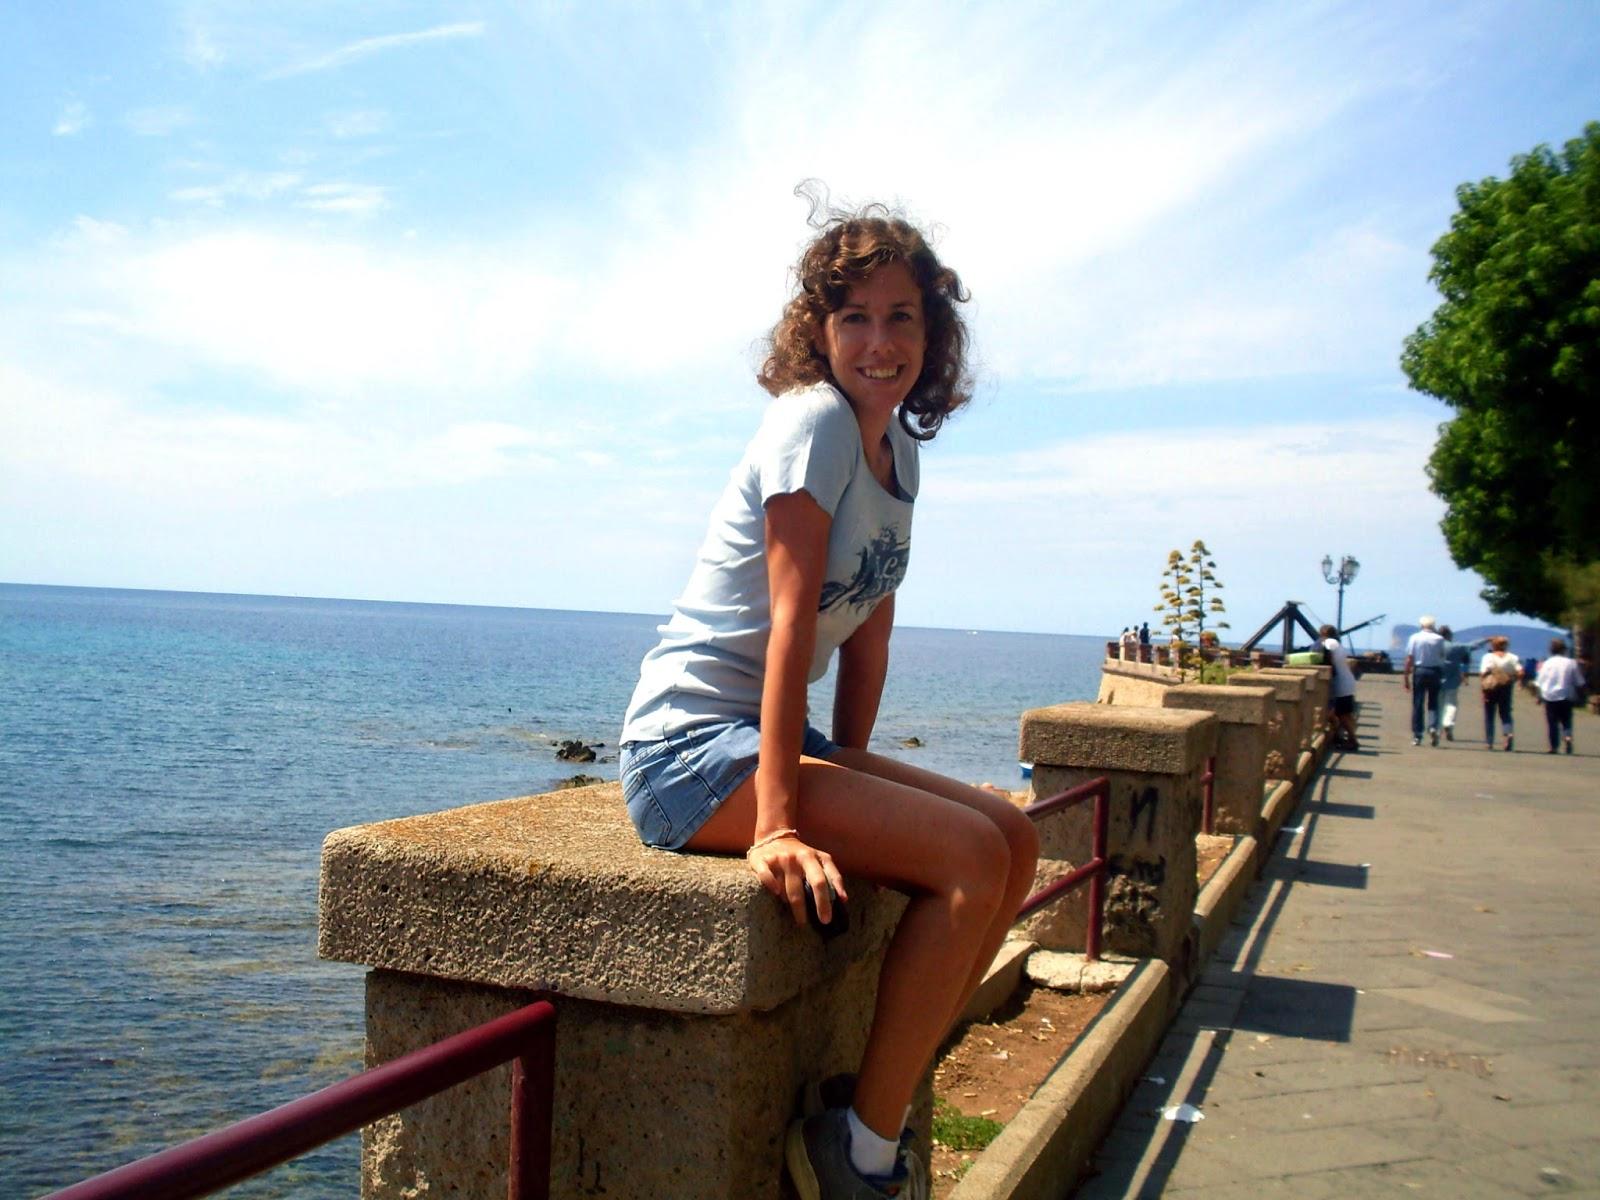 http://s-fashion-avenue.blogspot.it/2013/09/summer-memories-new-horizons.html